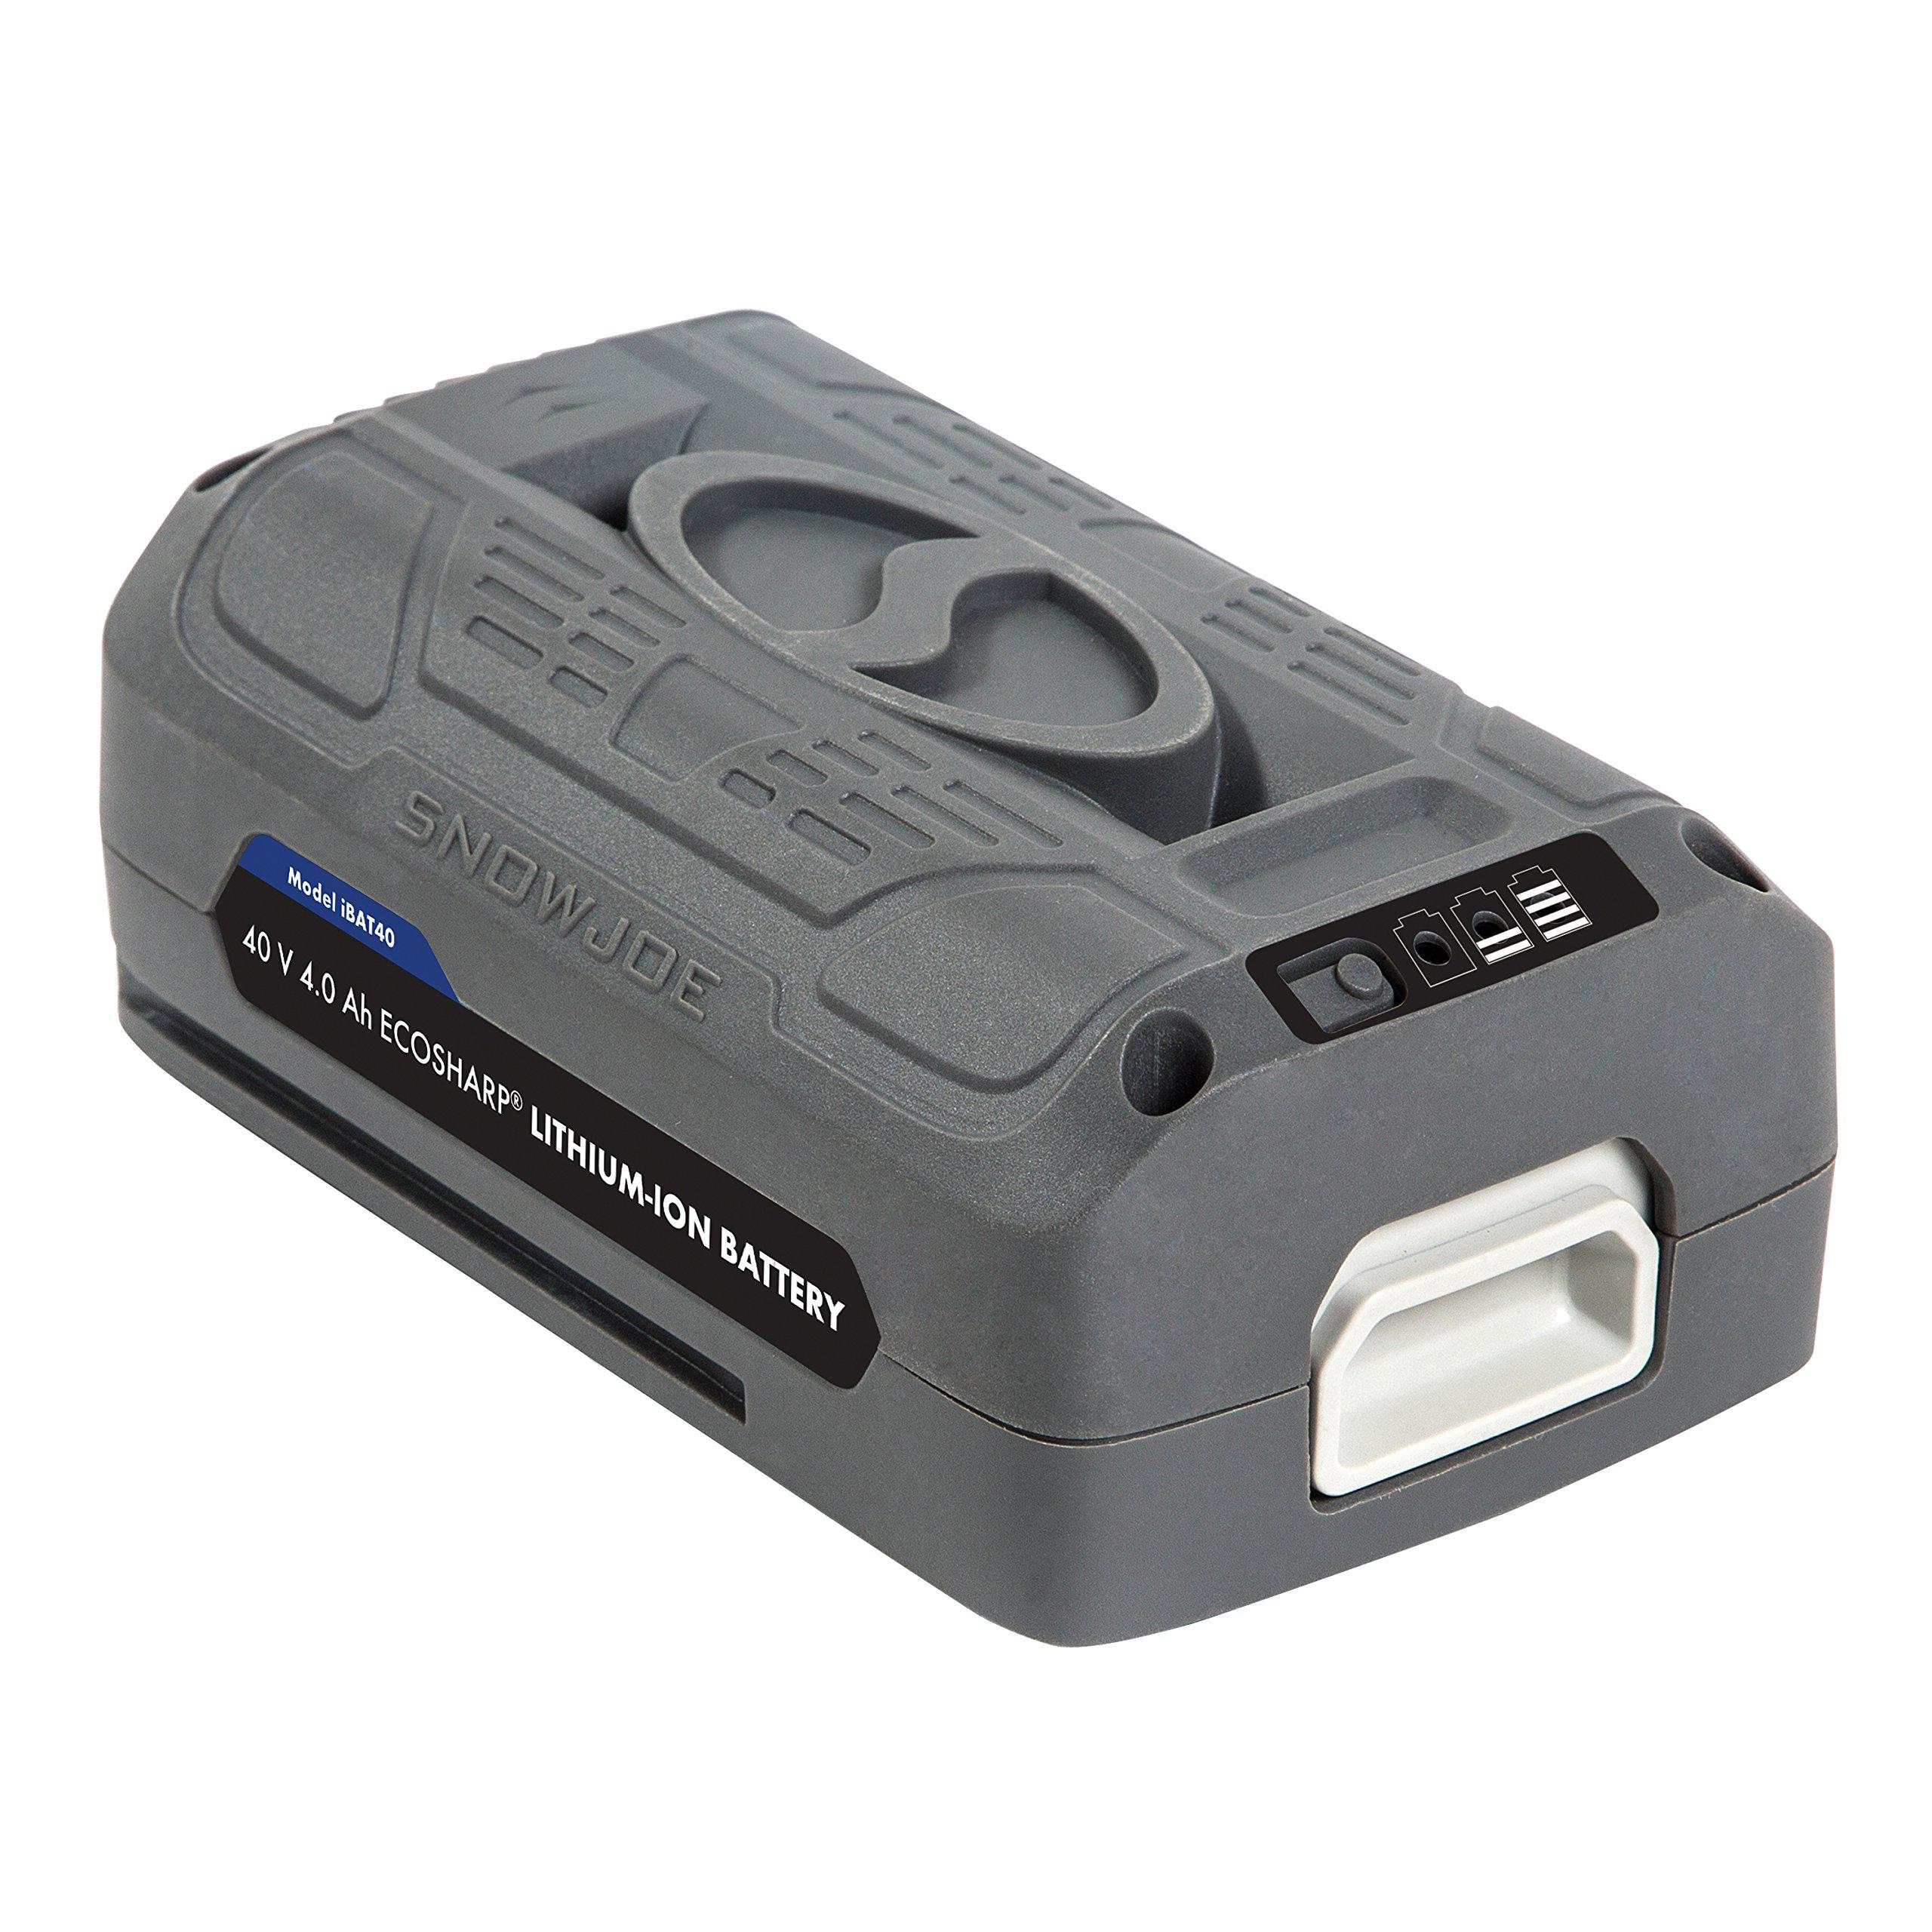 Snow Joe + Sun Joe iONMAX iBAT40 EcoSharp Lithium-Ion Battery | 40 Volt | 4.0 Ah by Snow Joe (Image #2)